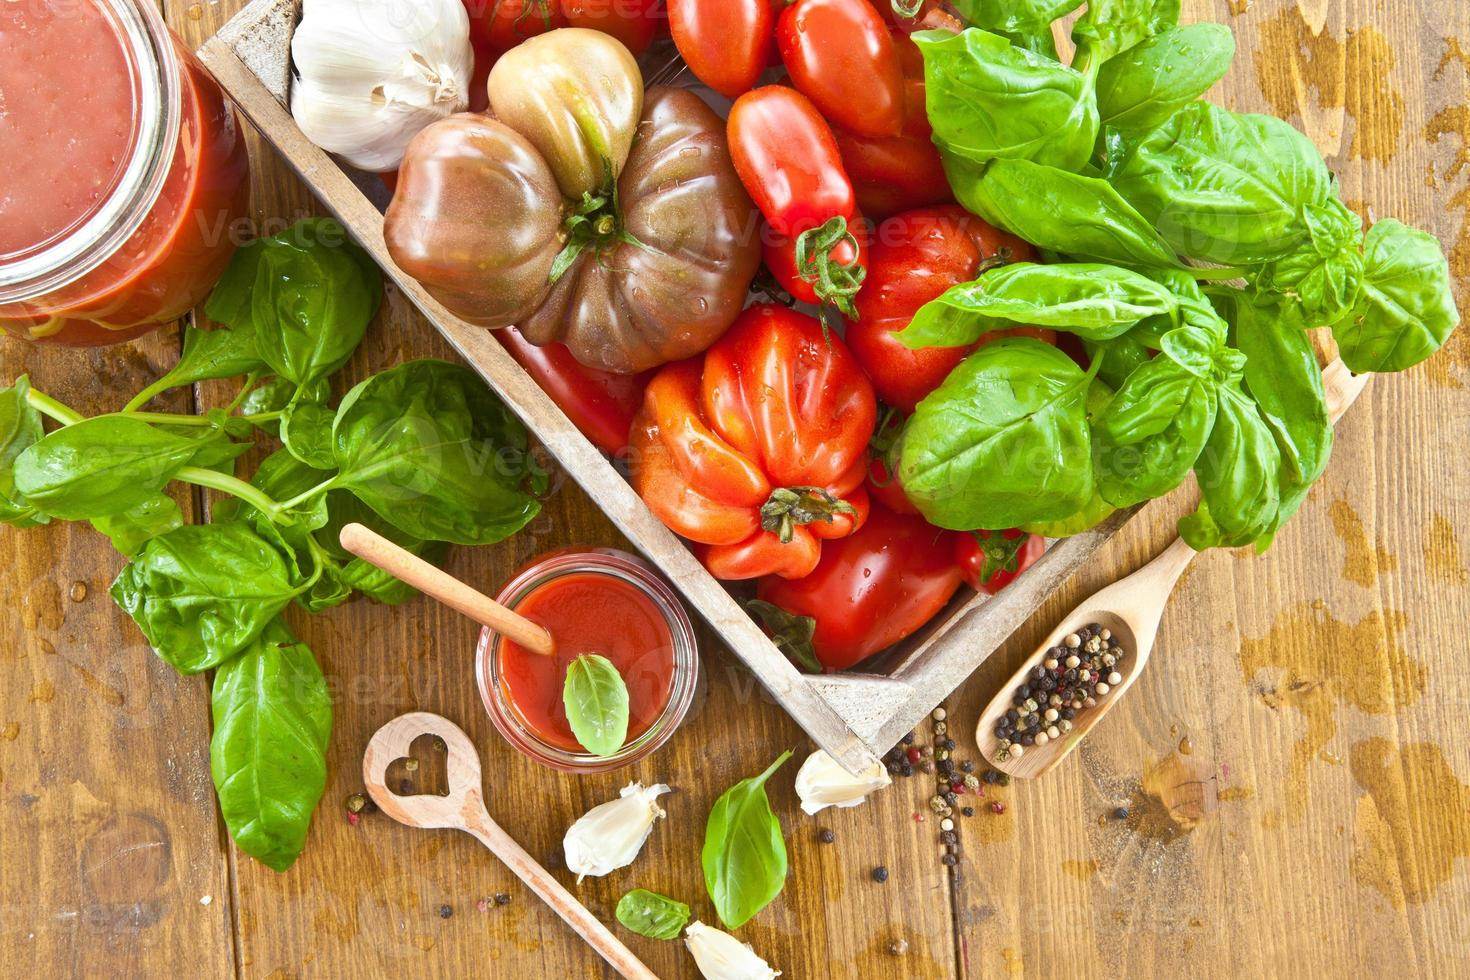 Homemade tomato sauce photo